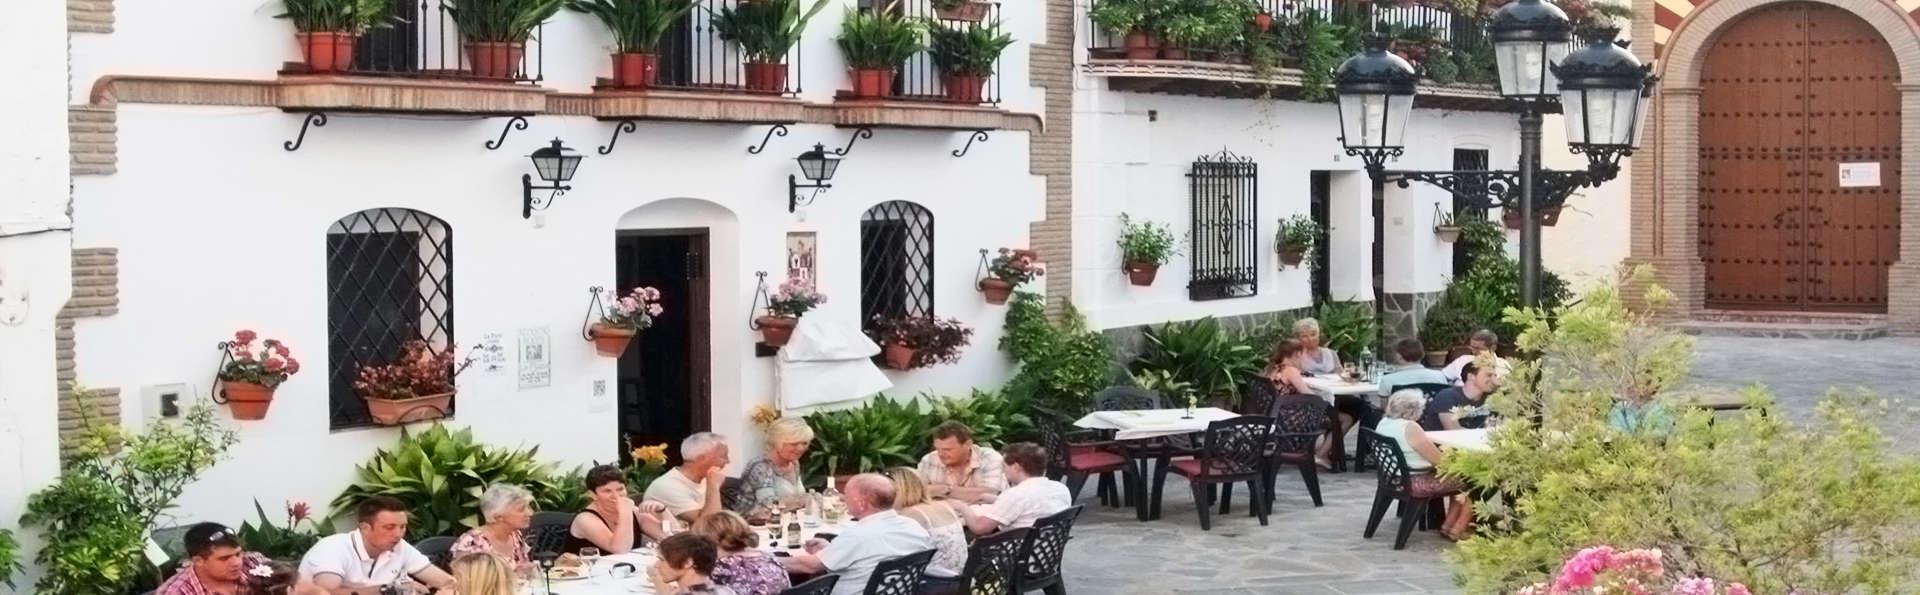 Hotel Posada la Plaza - EDIT_EXT_VIEW_9.jpg